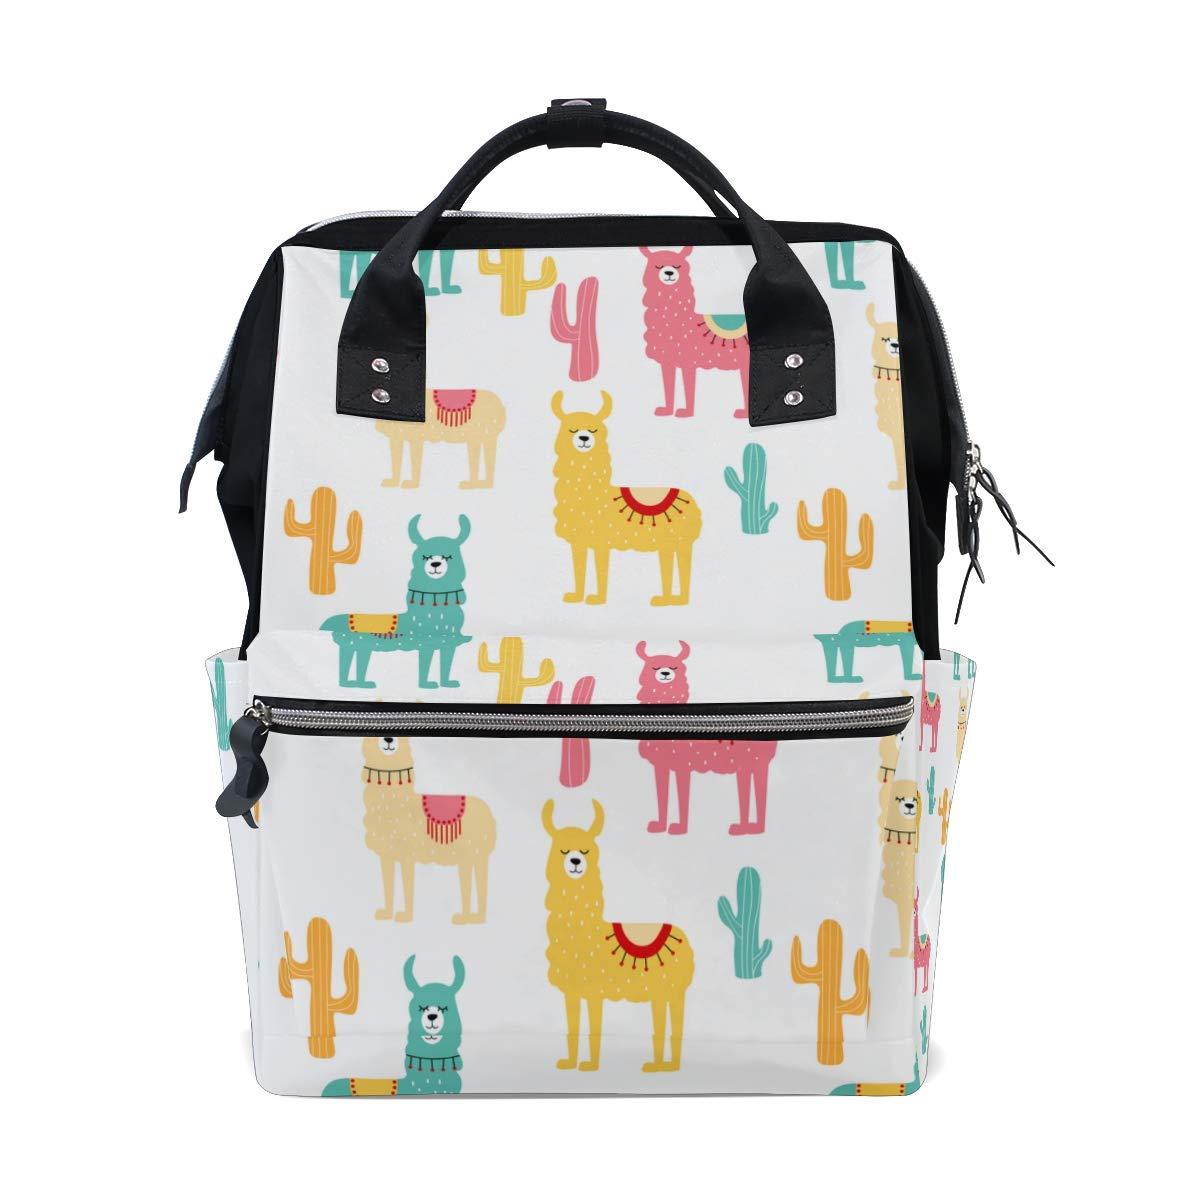 A Seed Backpack Baby Diaper Bag Llamas Cute Animal for Girls Women Tote Daypack Bookbag